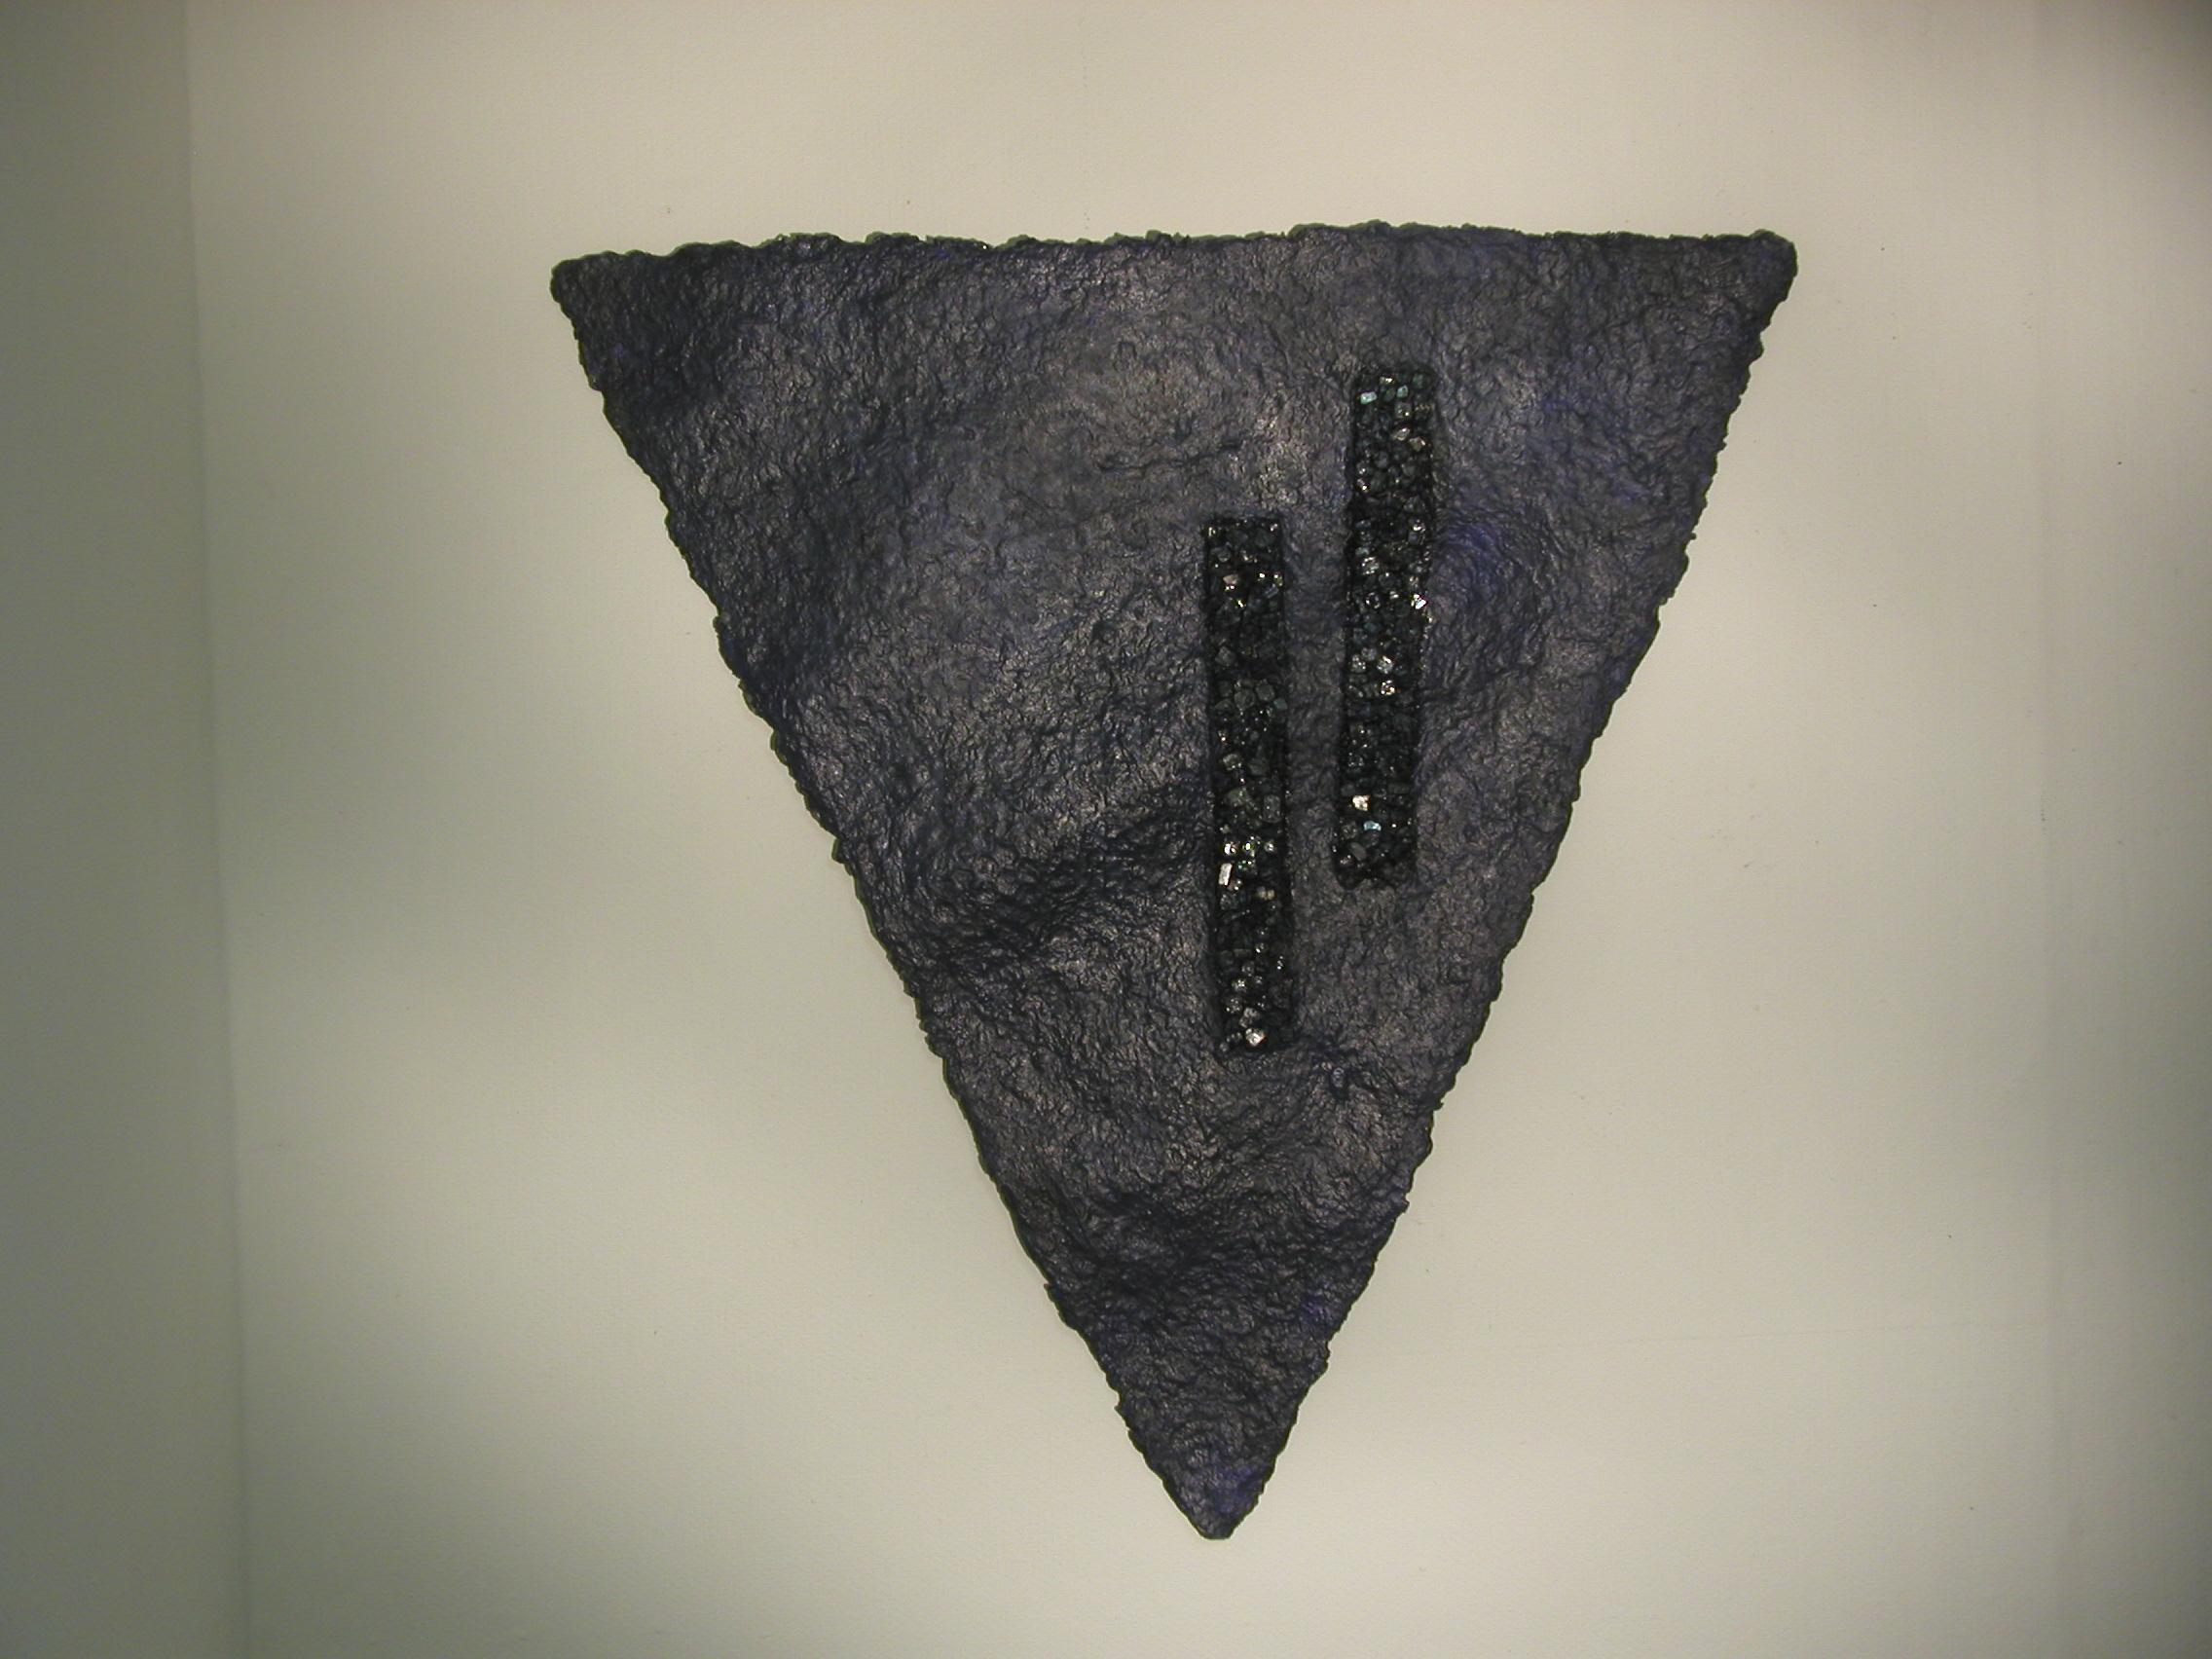 Triangel 2 84x89 3500 kr